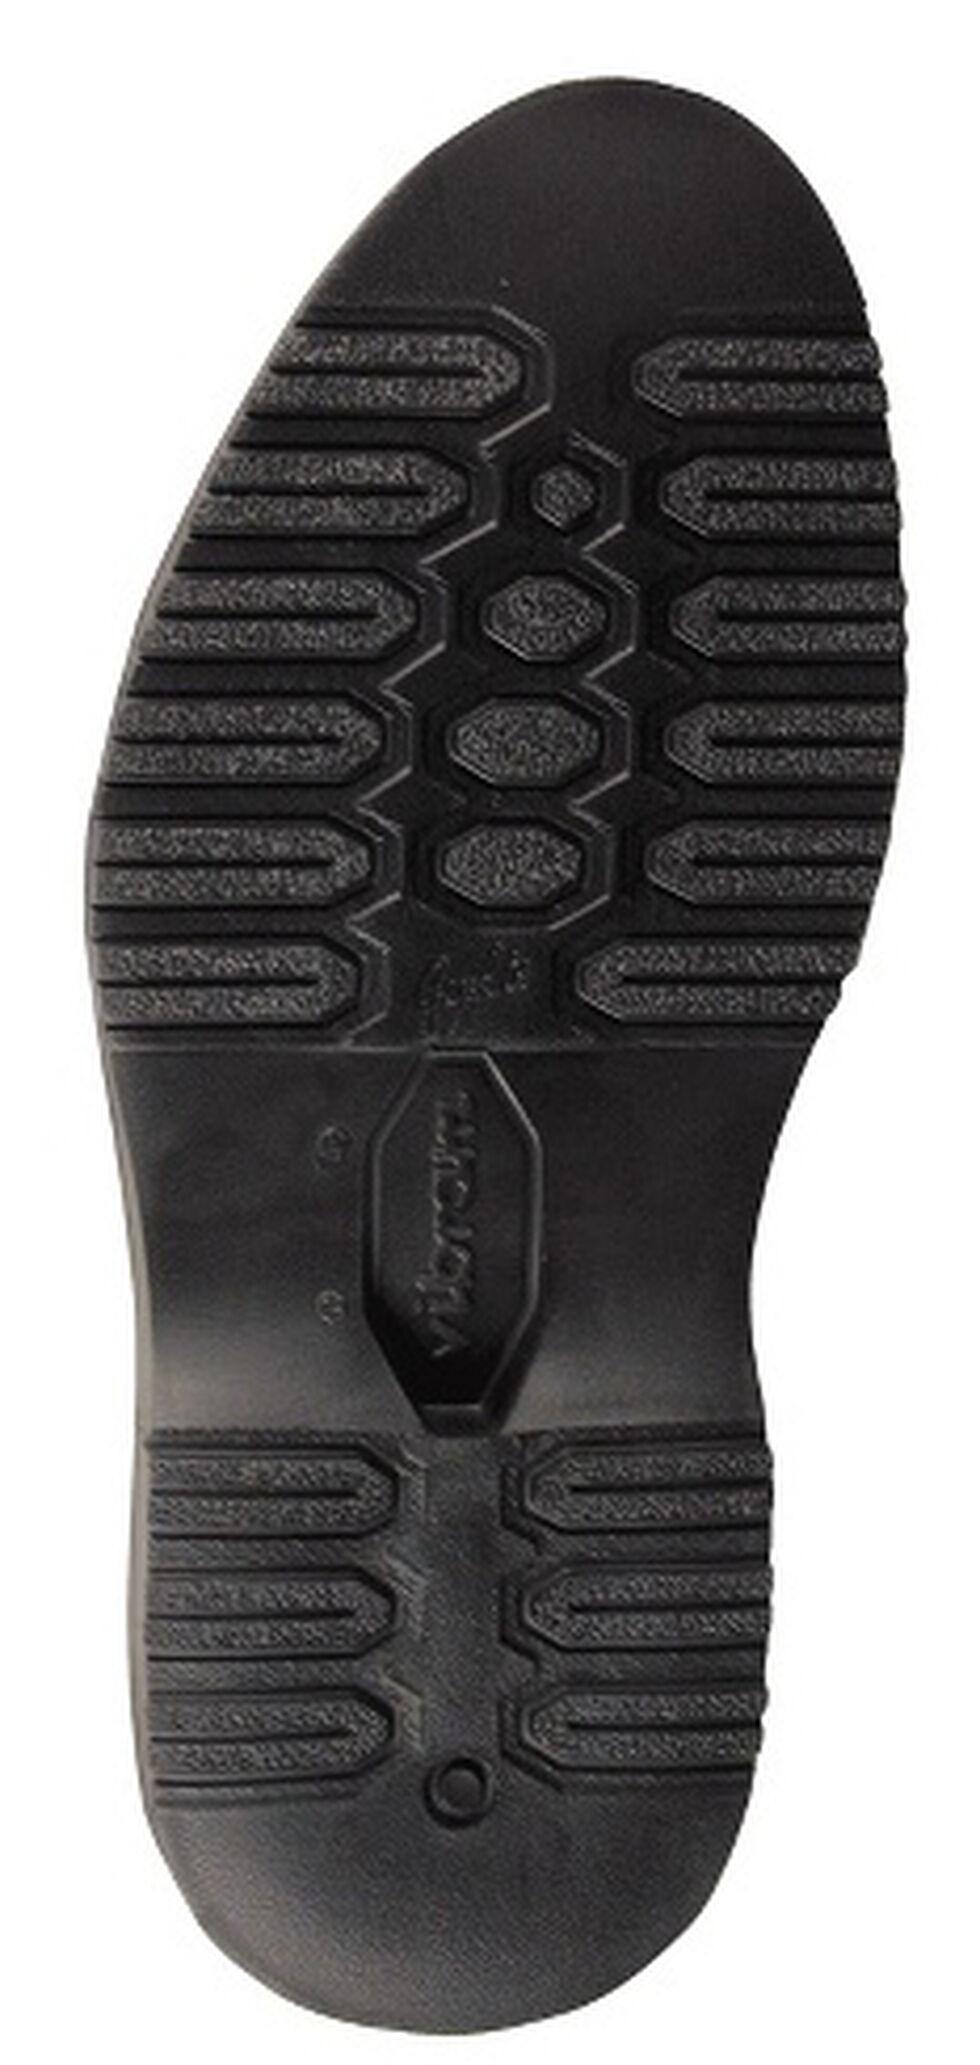 Chippewa Back Zipper Pull-On Snake Boots - Mocc Toe, Mahogany, hi-res